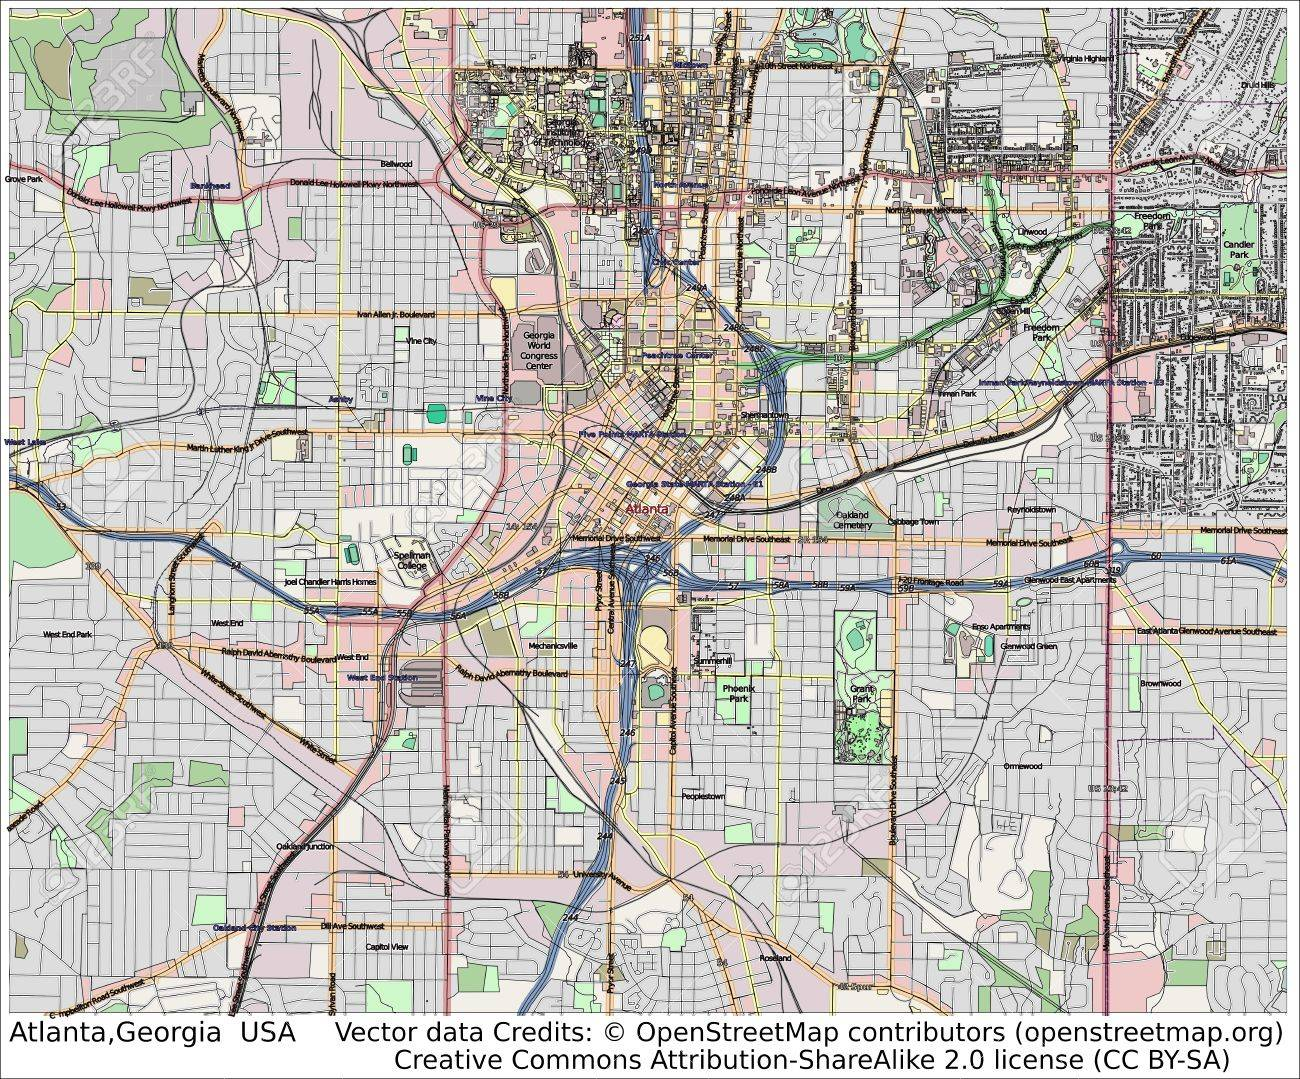 Atlanta Georgia USA City Map Aerial View Stock Photo Picture And - Georgia usa map